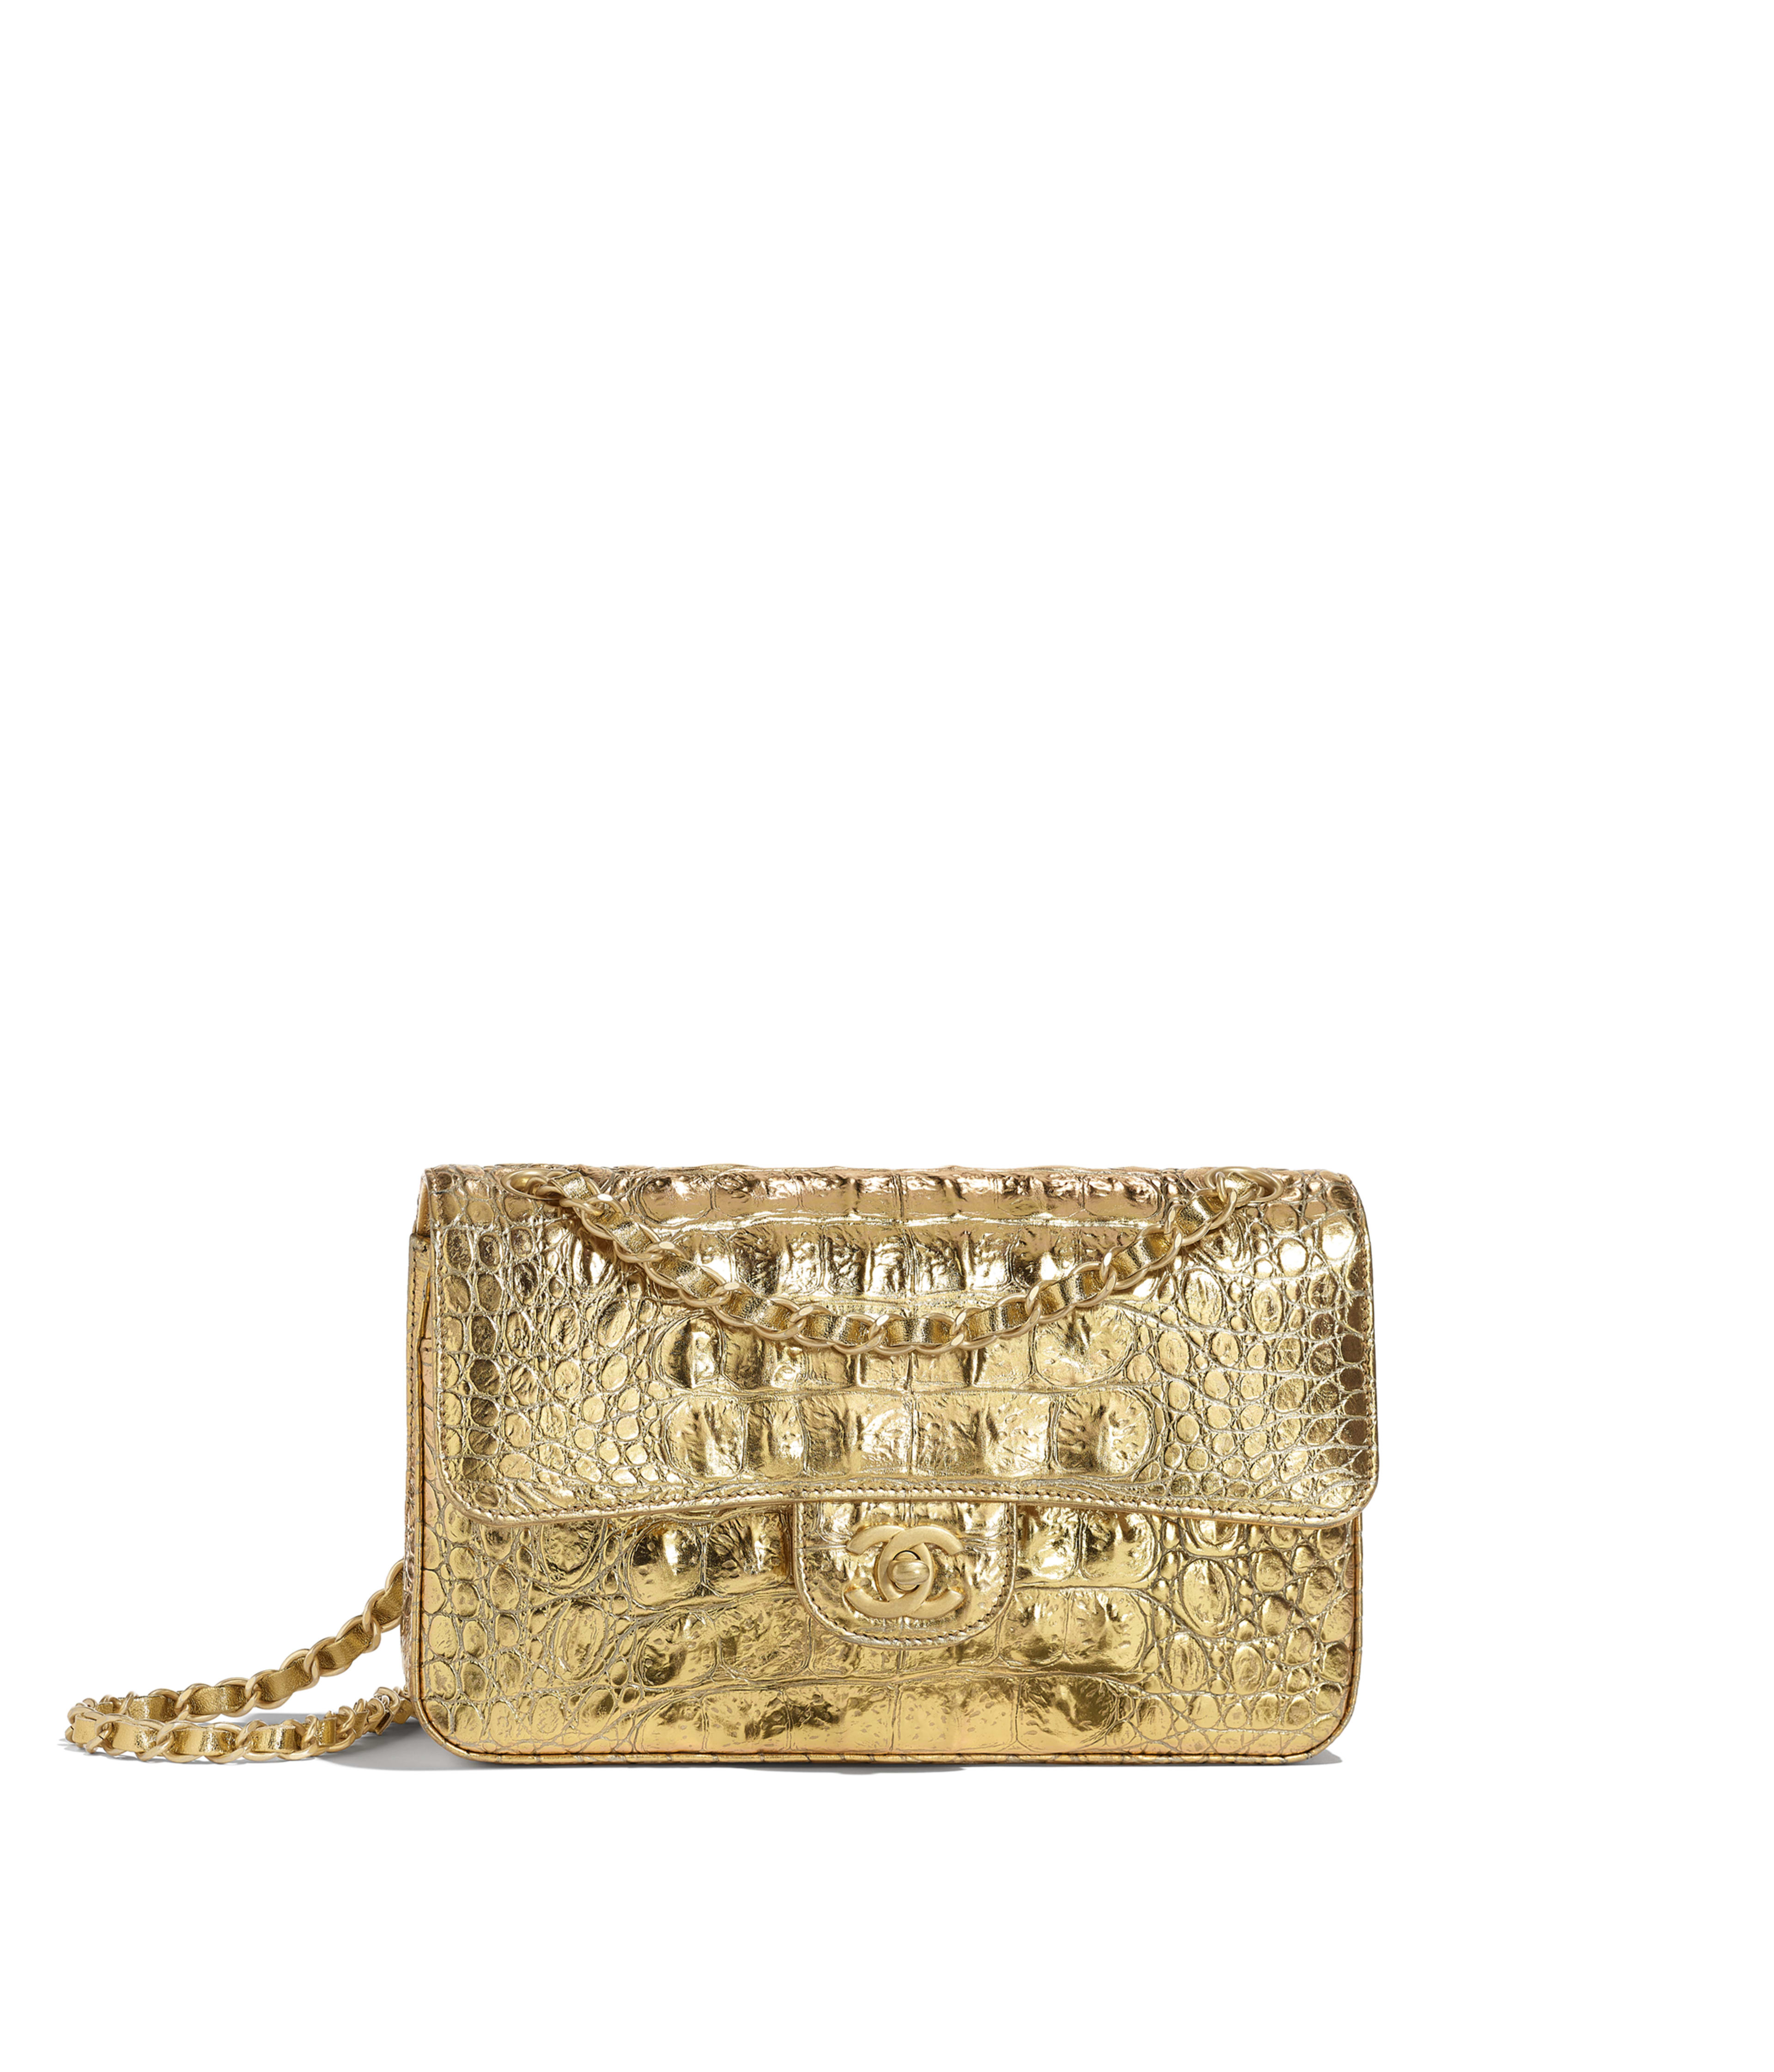 ef127c6af128c4 Small Classic Handbag Metallic Crocodile Embossed Calfskin & Gold Metal,  Gold Ref. A01113B00798N4752